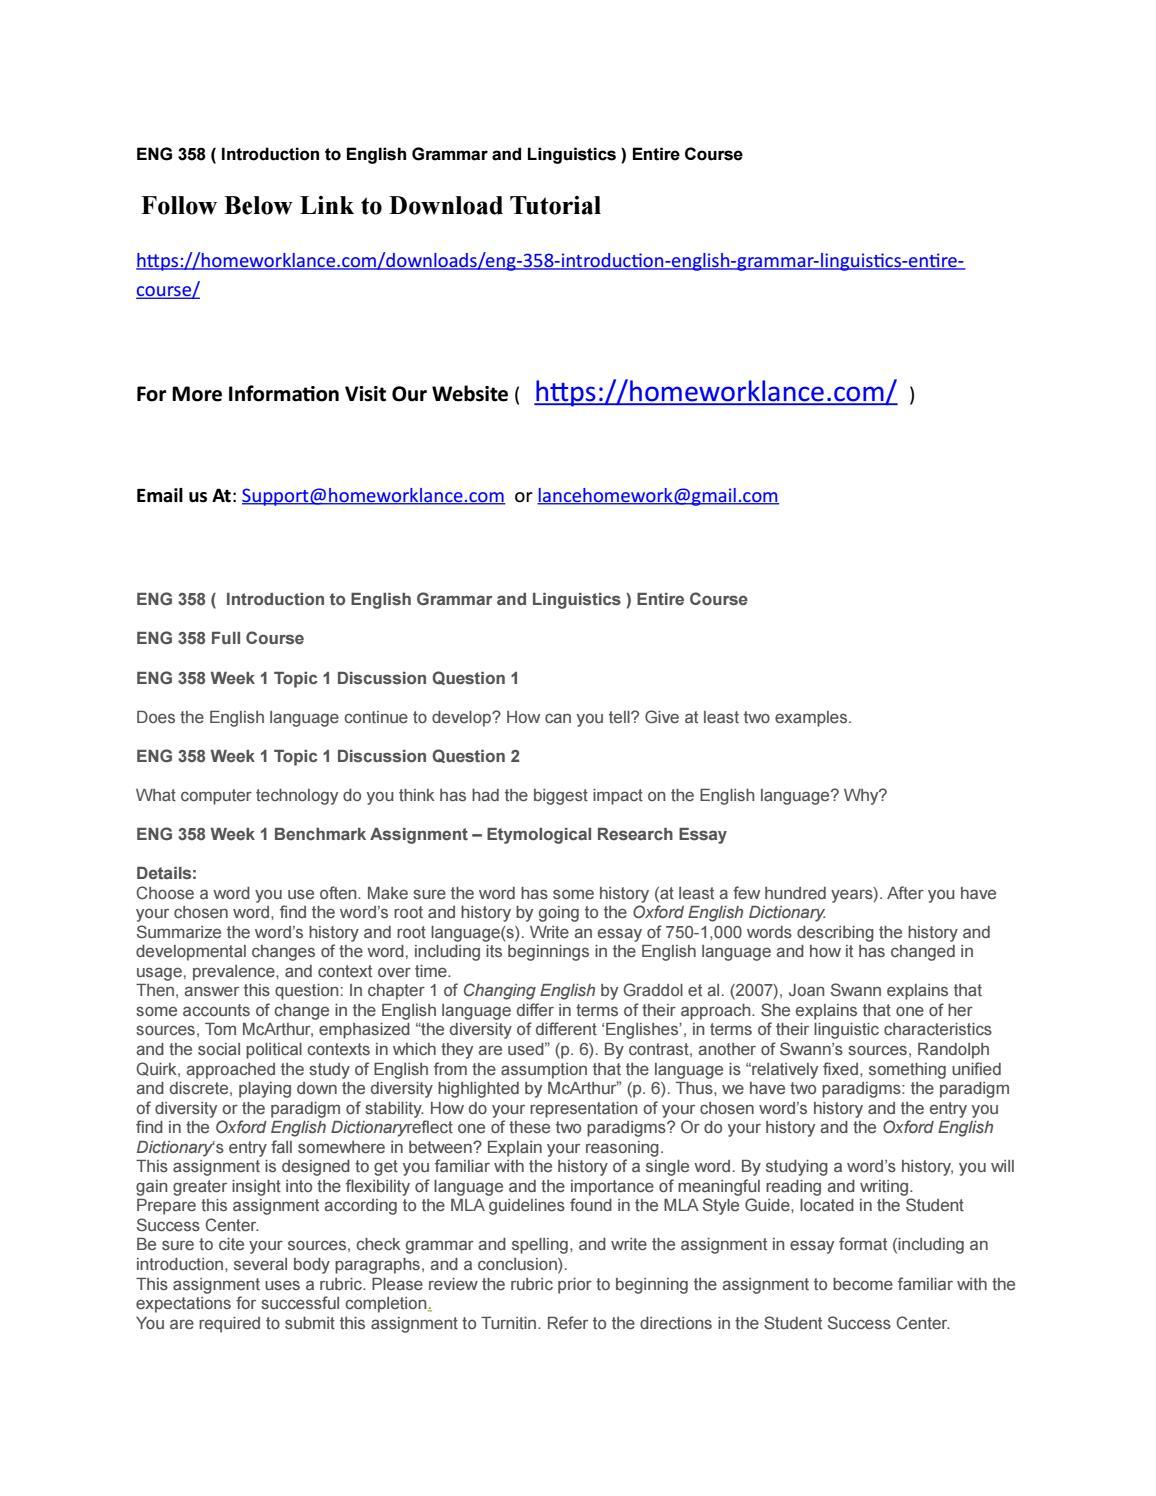 Free Worksheet Dangling Modifier Worksheet atidentity – Dangling and Misplaced Modifiers Worksheet